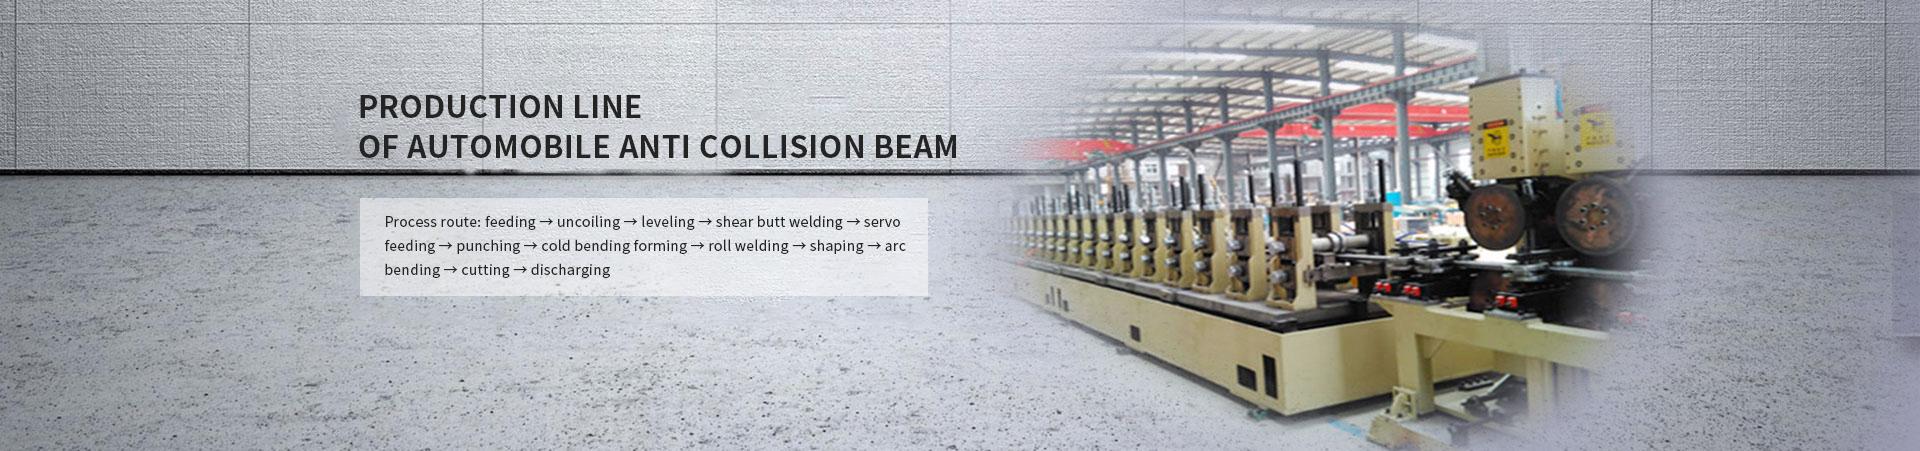 High-strength automobile anti-collision beam